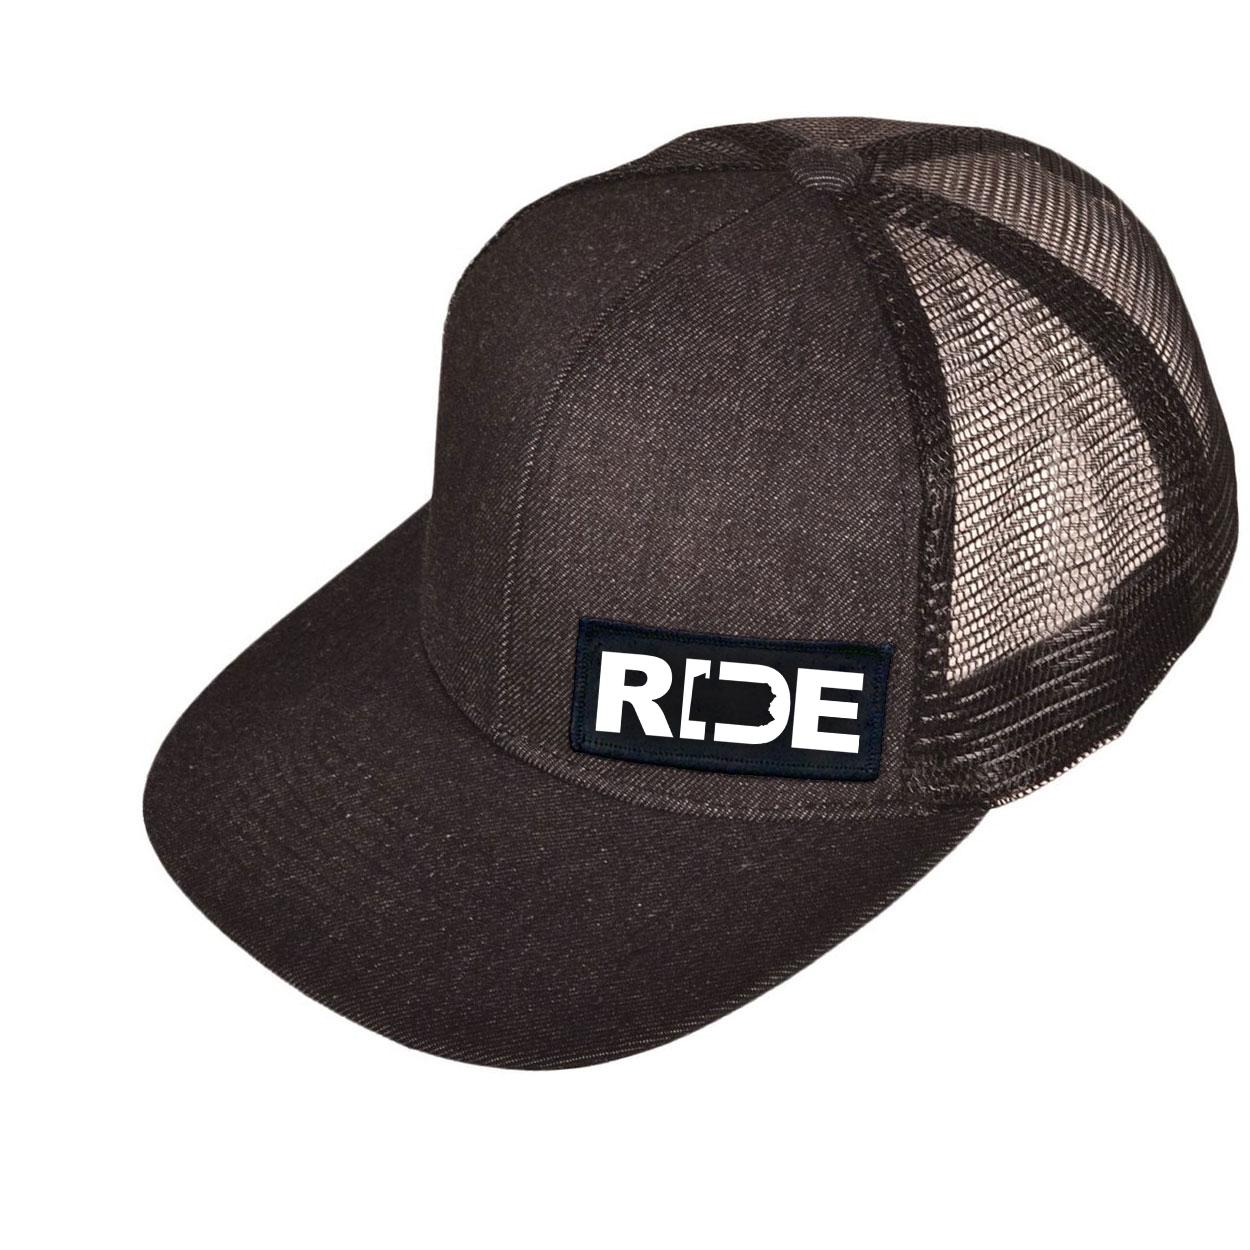 Ride Pennsylvania Night Out Woven Patch Snapback Flat Brim Hat Black Denim (White Logo)